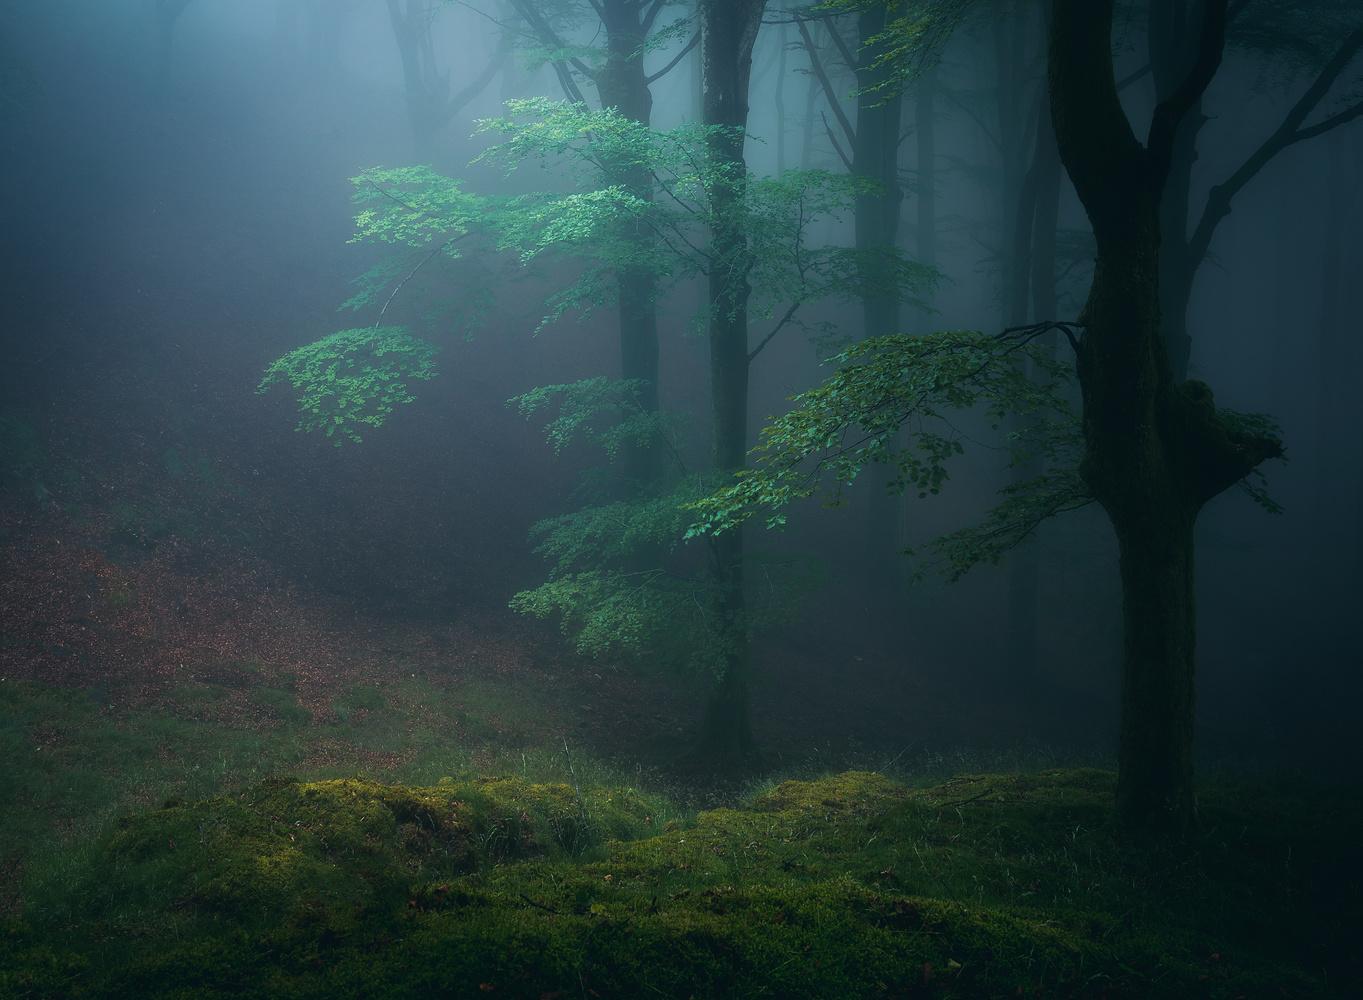 Forest glade by Daniel Martin